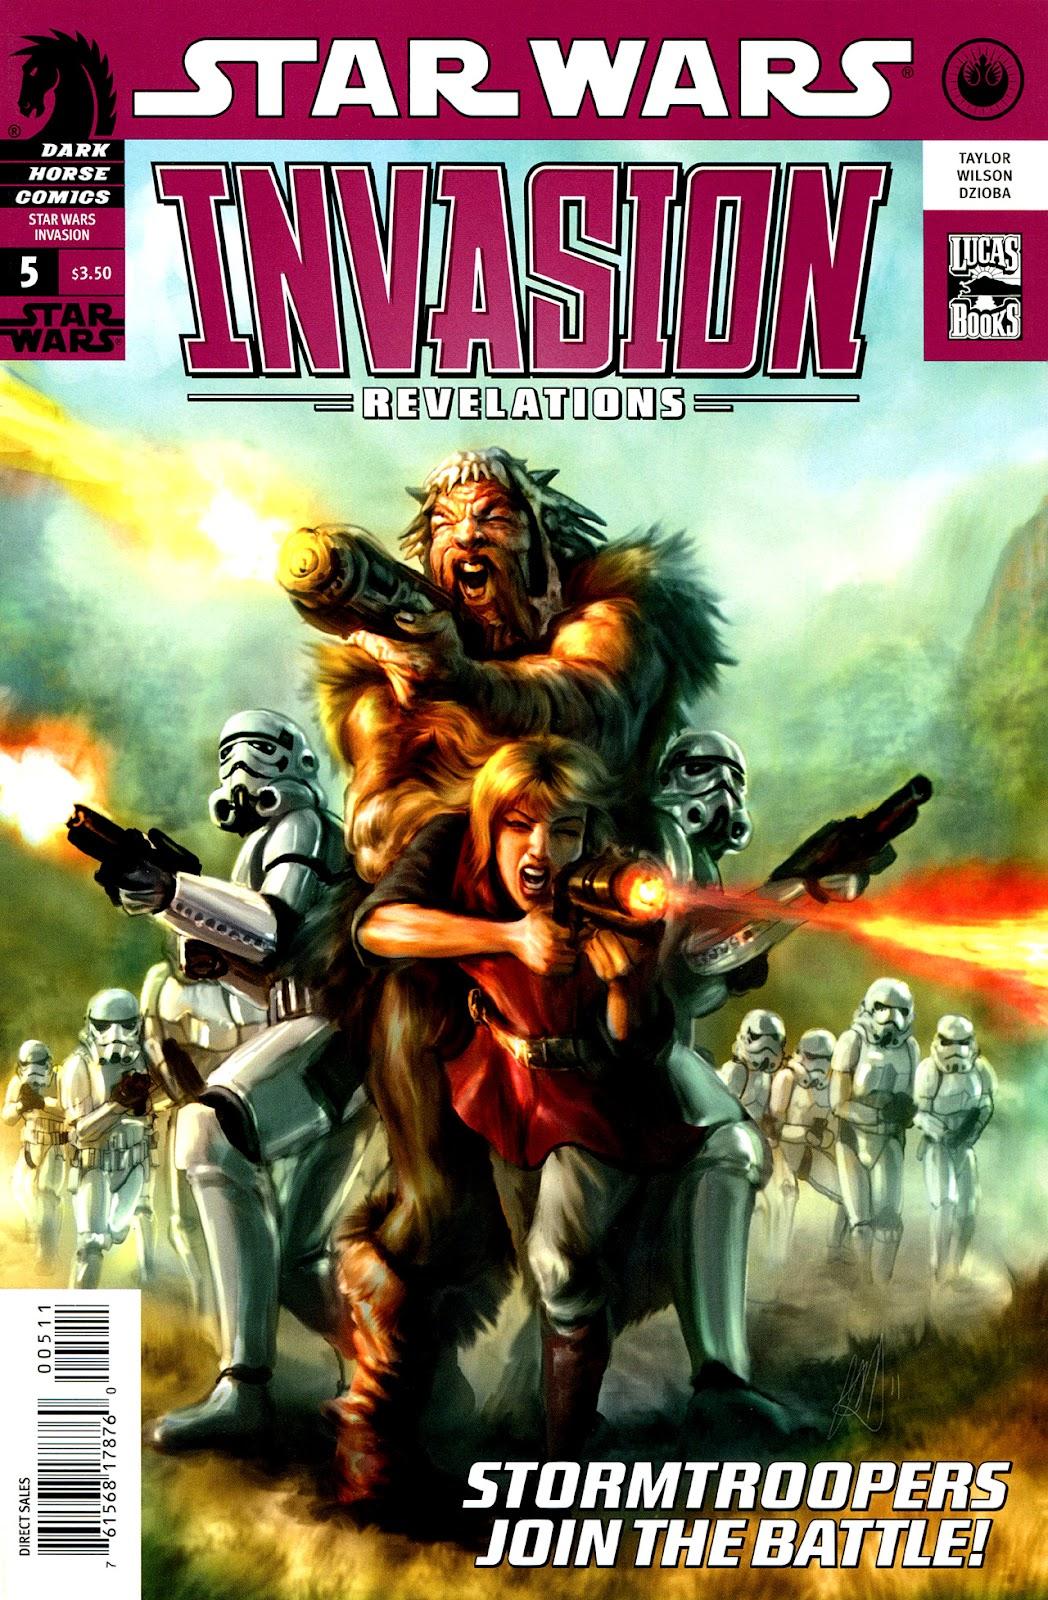 Star Wars: Invasion - Revelations issue 5 - Page 1